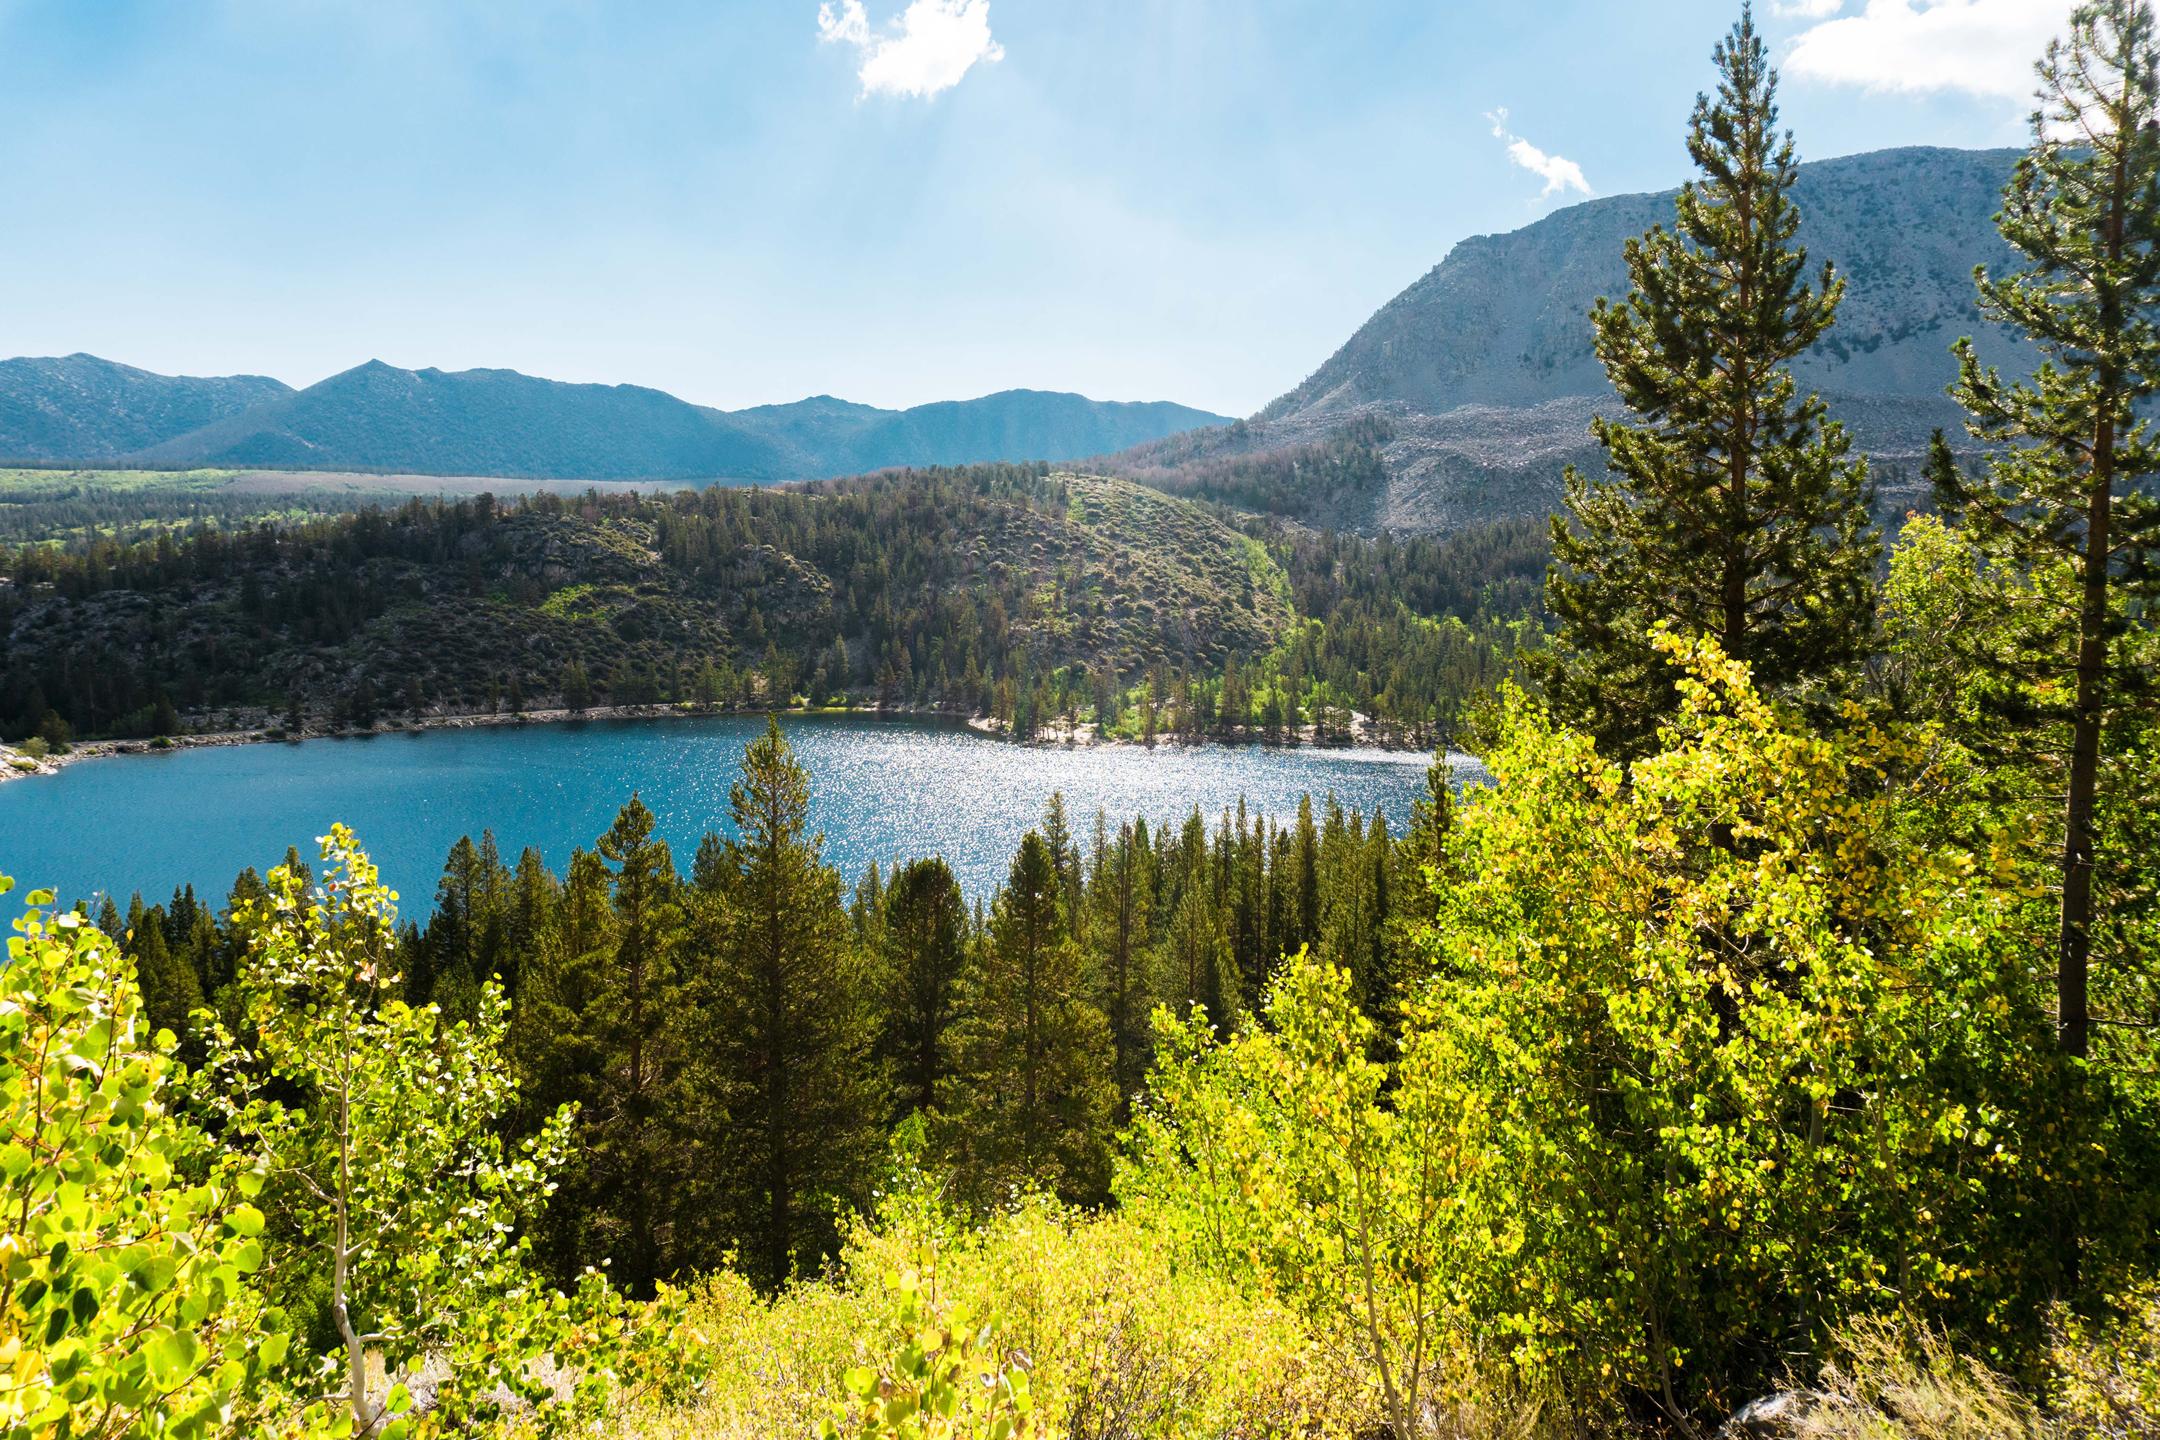 2016-08-31-Fall-Rock-Creek-Fall-Color-Viewing-WRAY-29.jpg